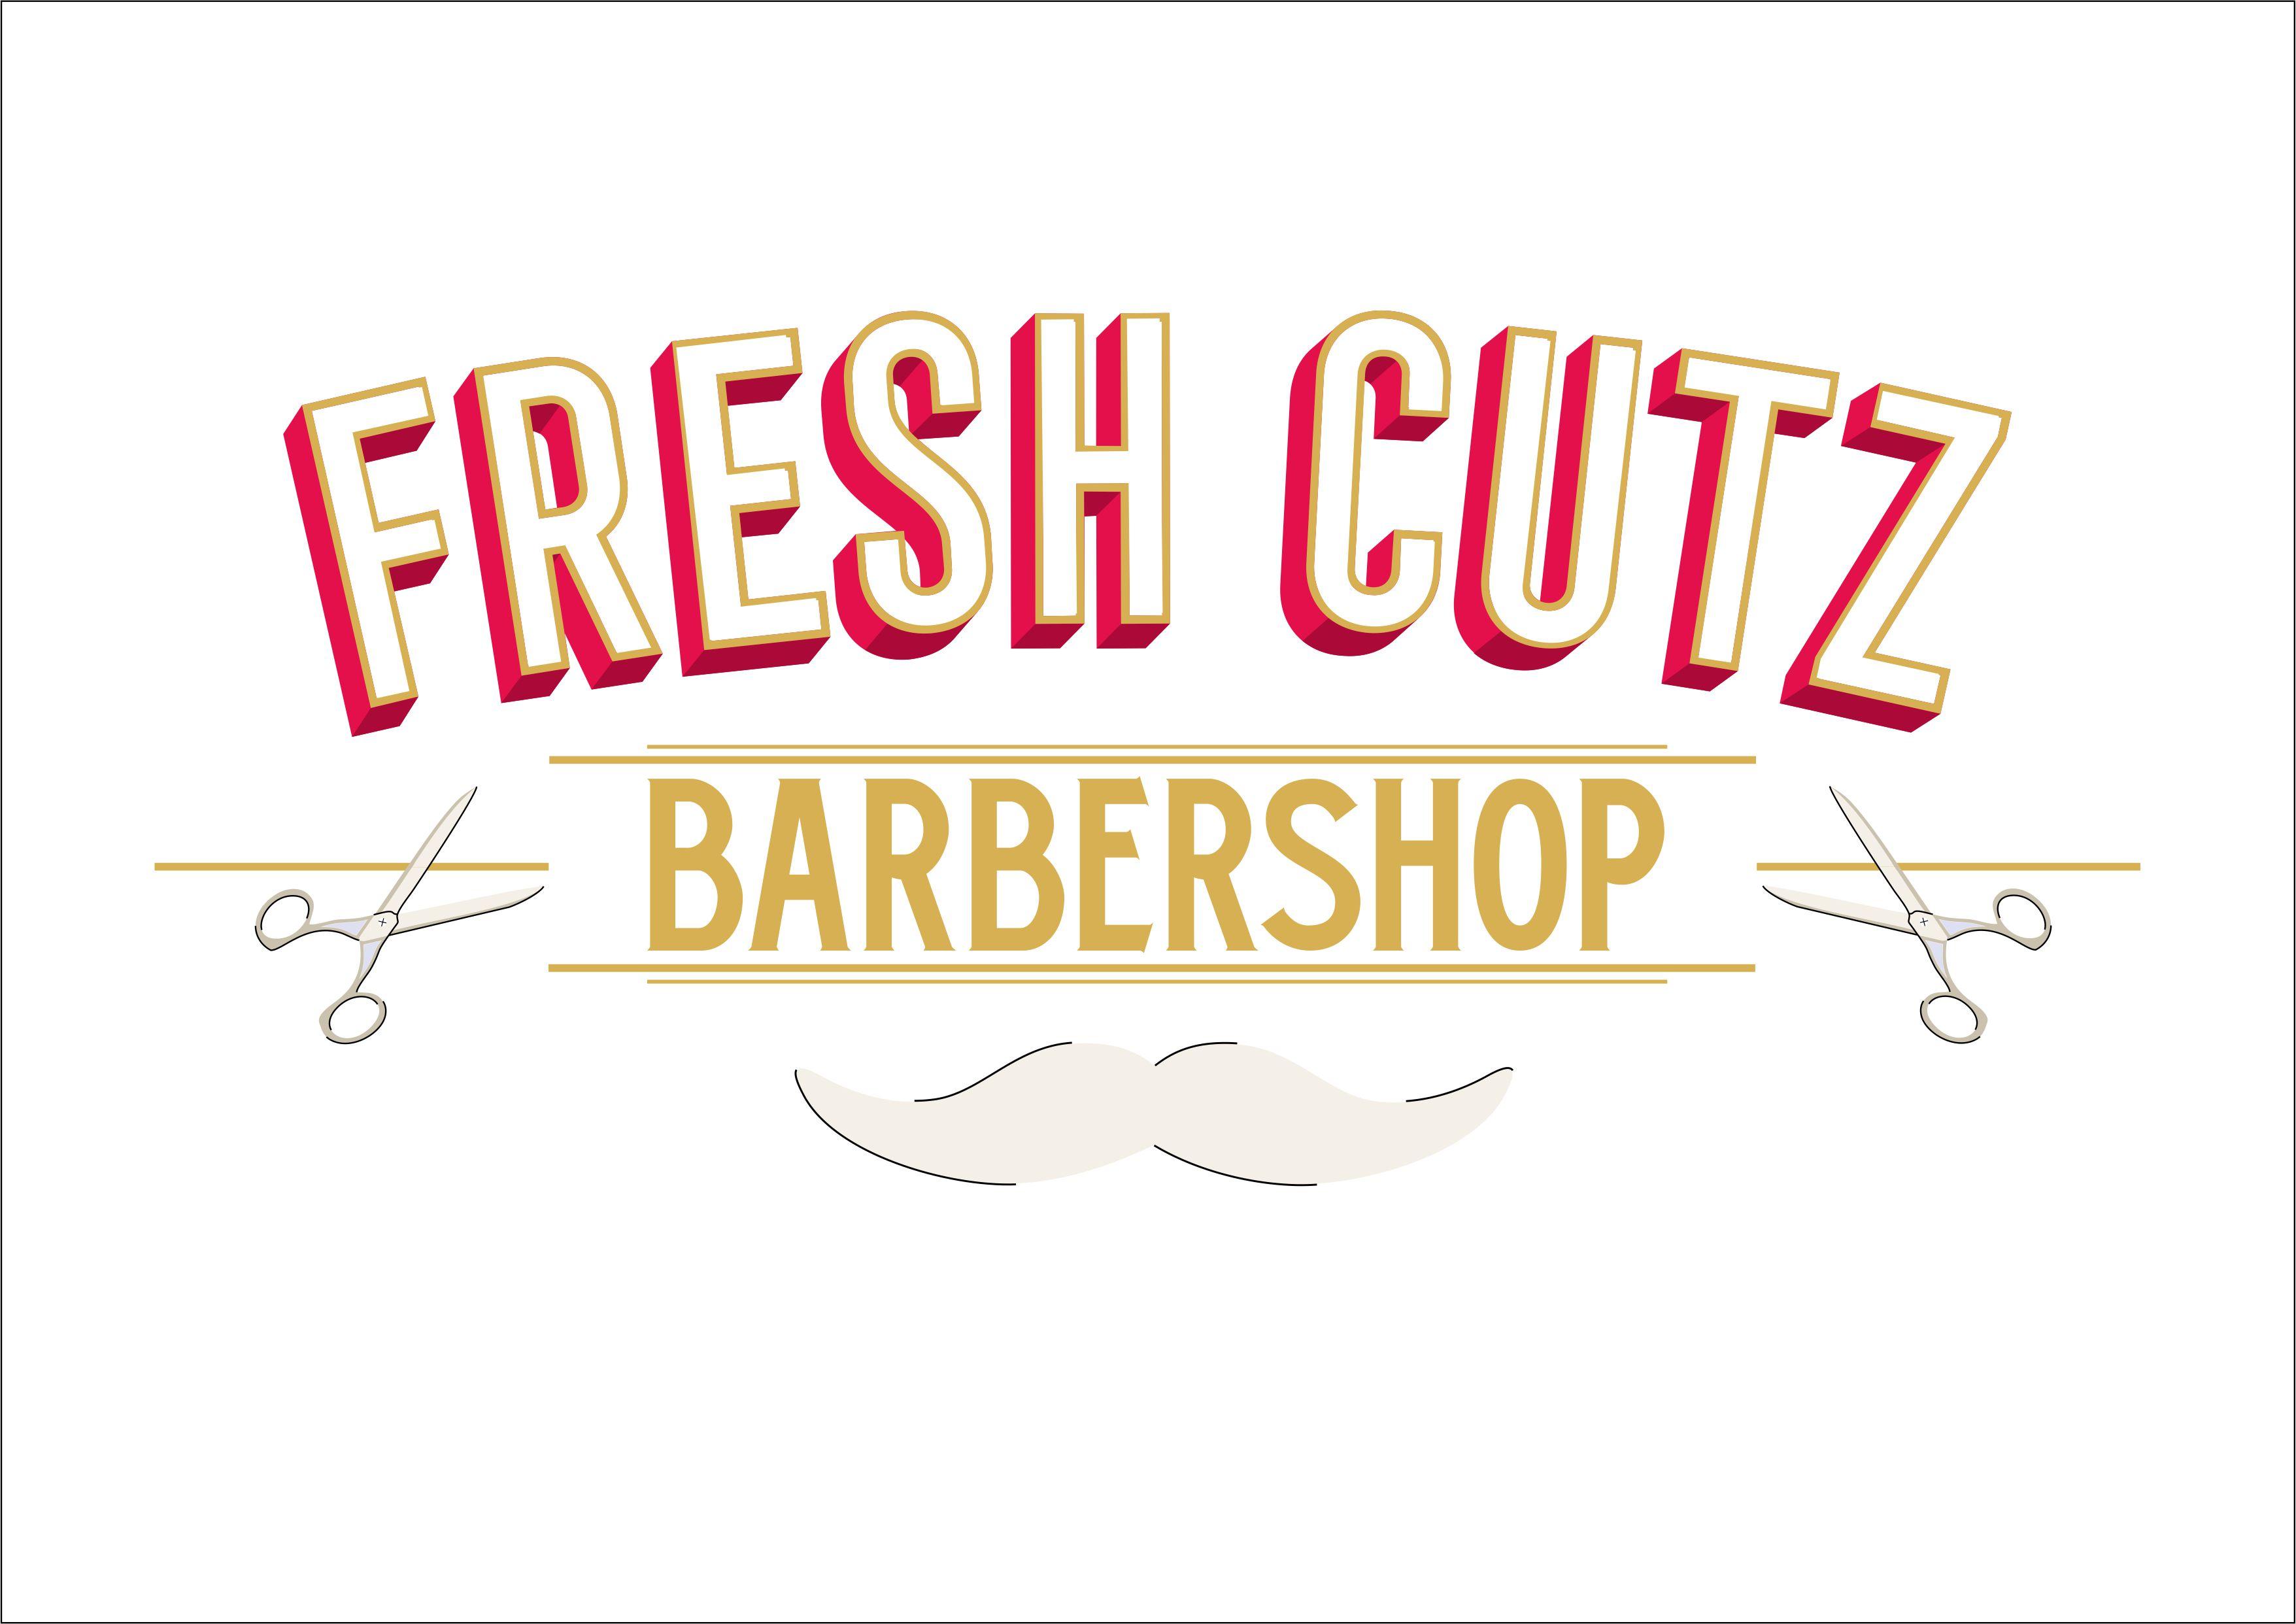 Fresh cutz barbershop logo